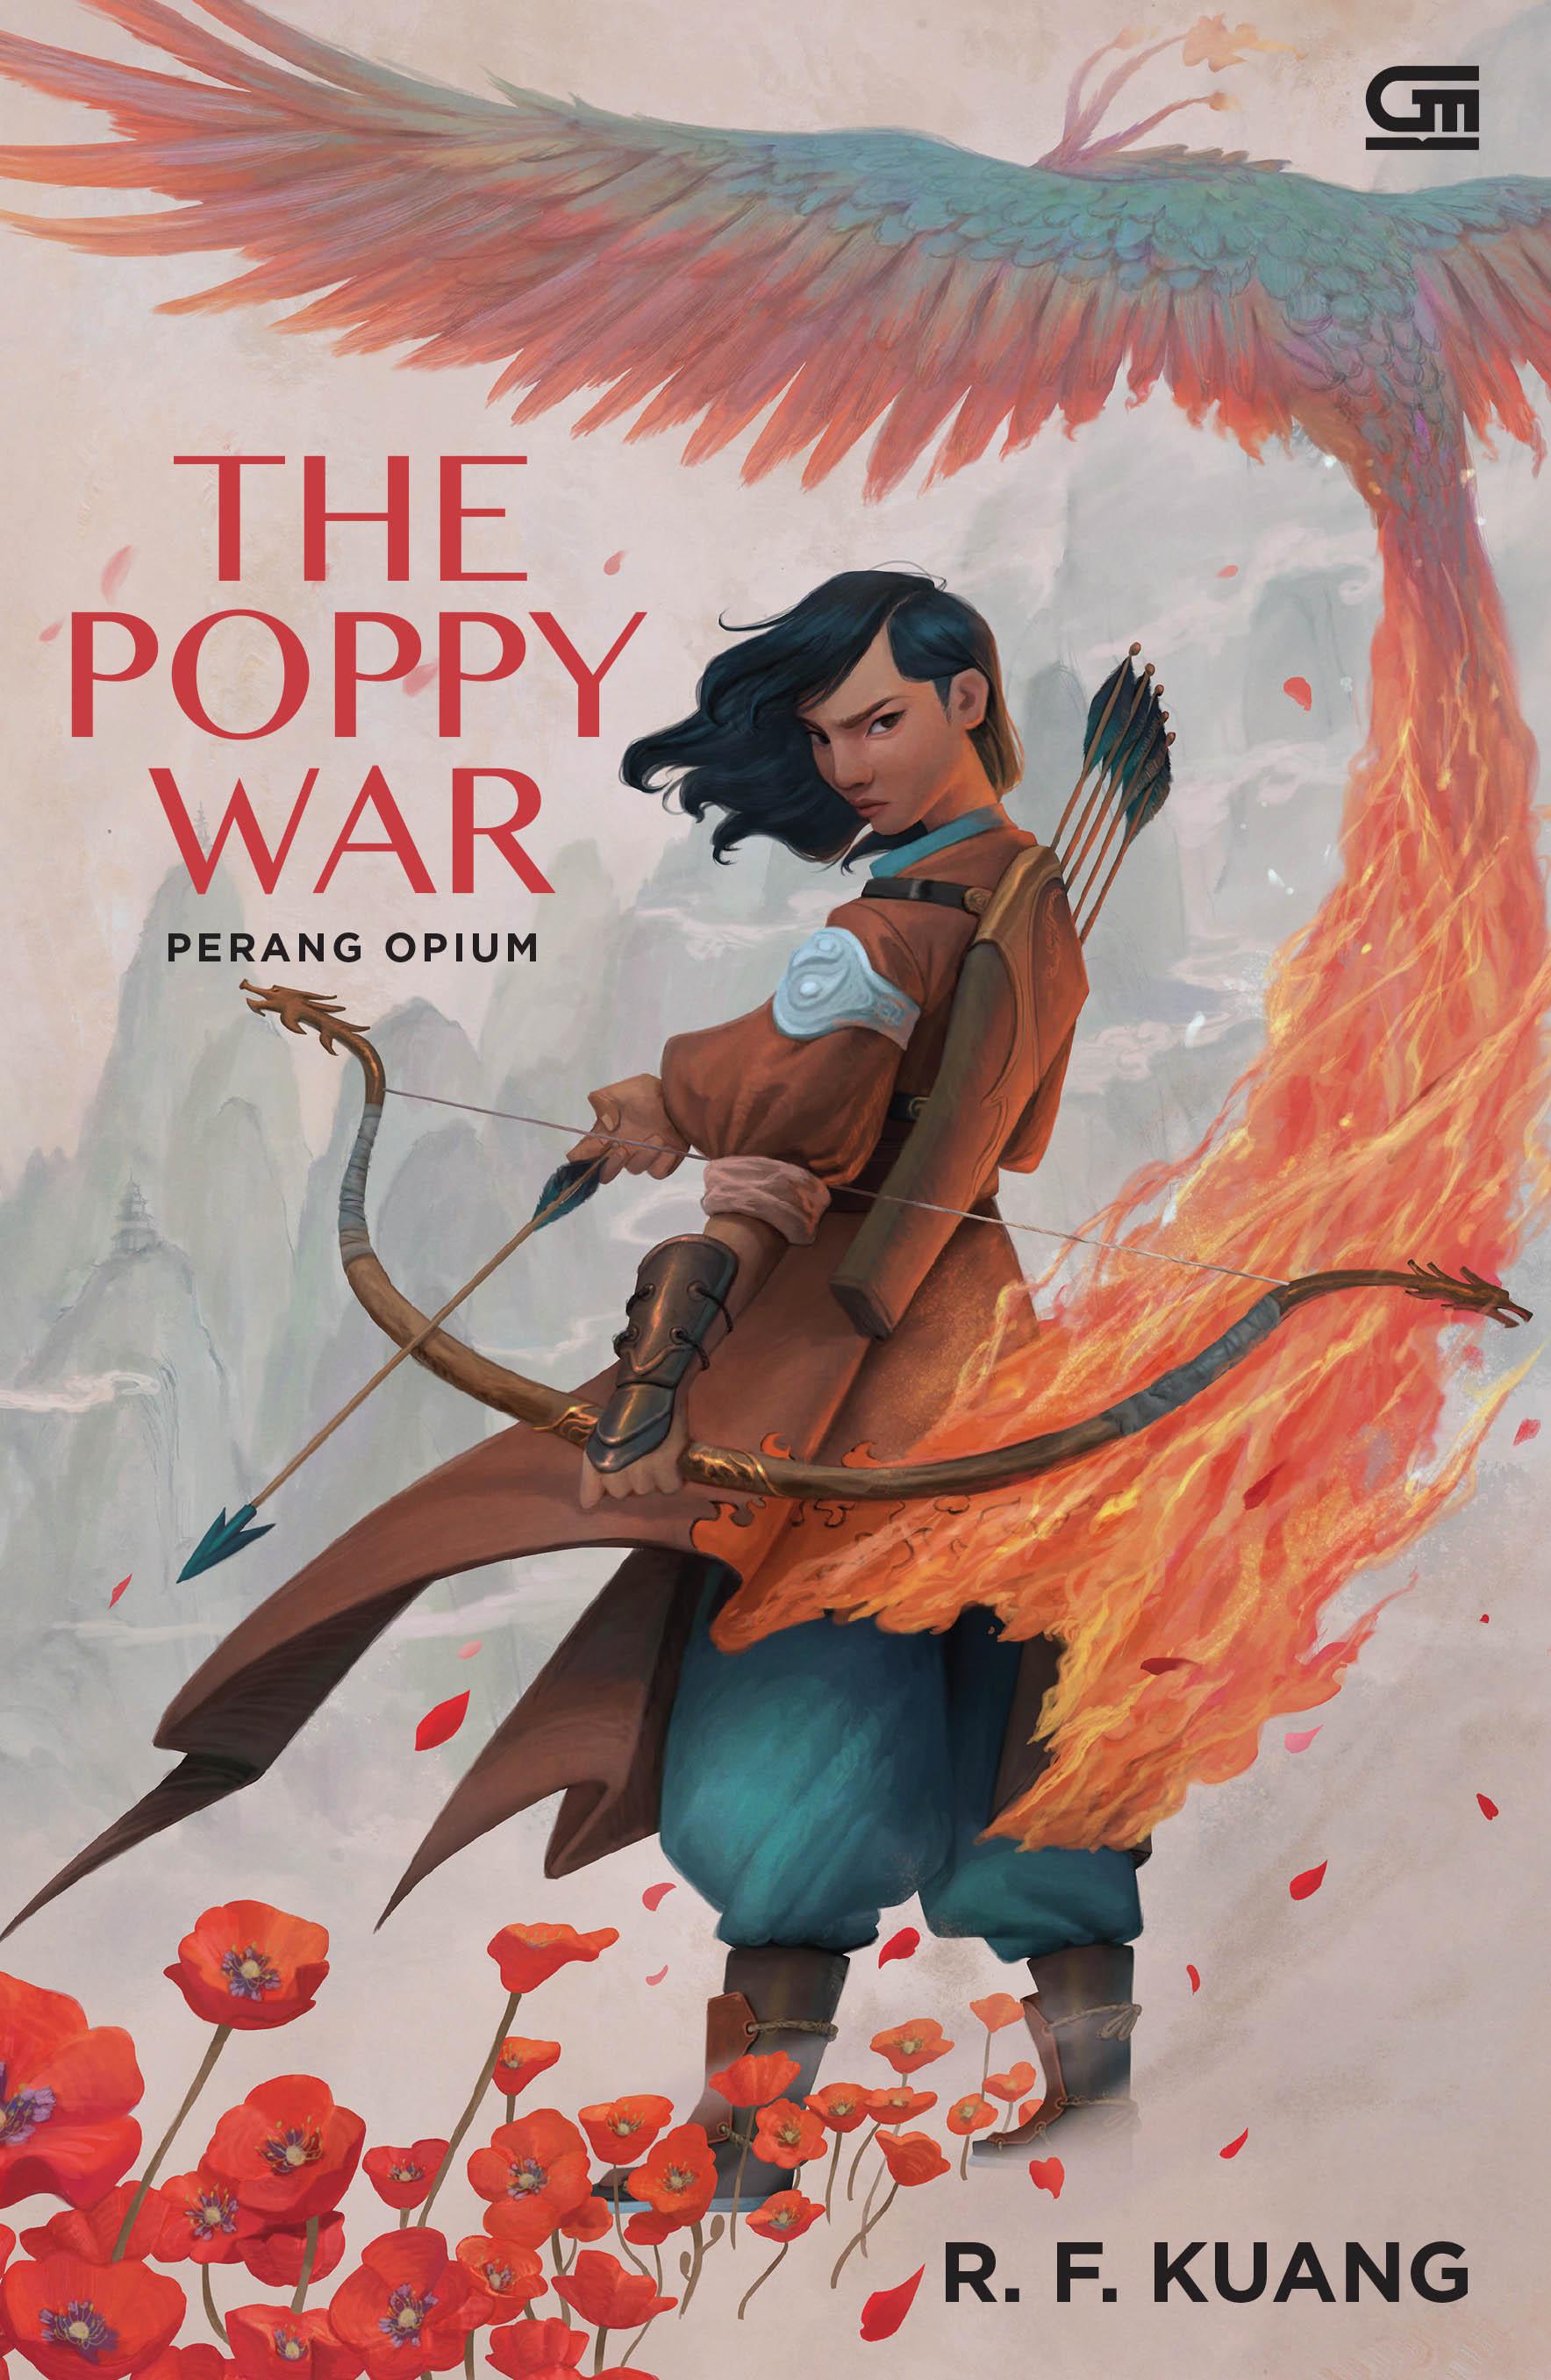 Perang Opium (The Poppy War)